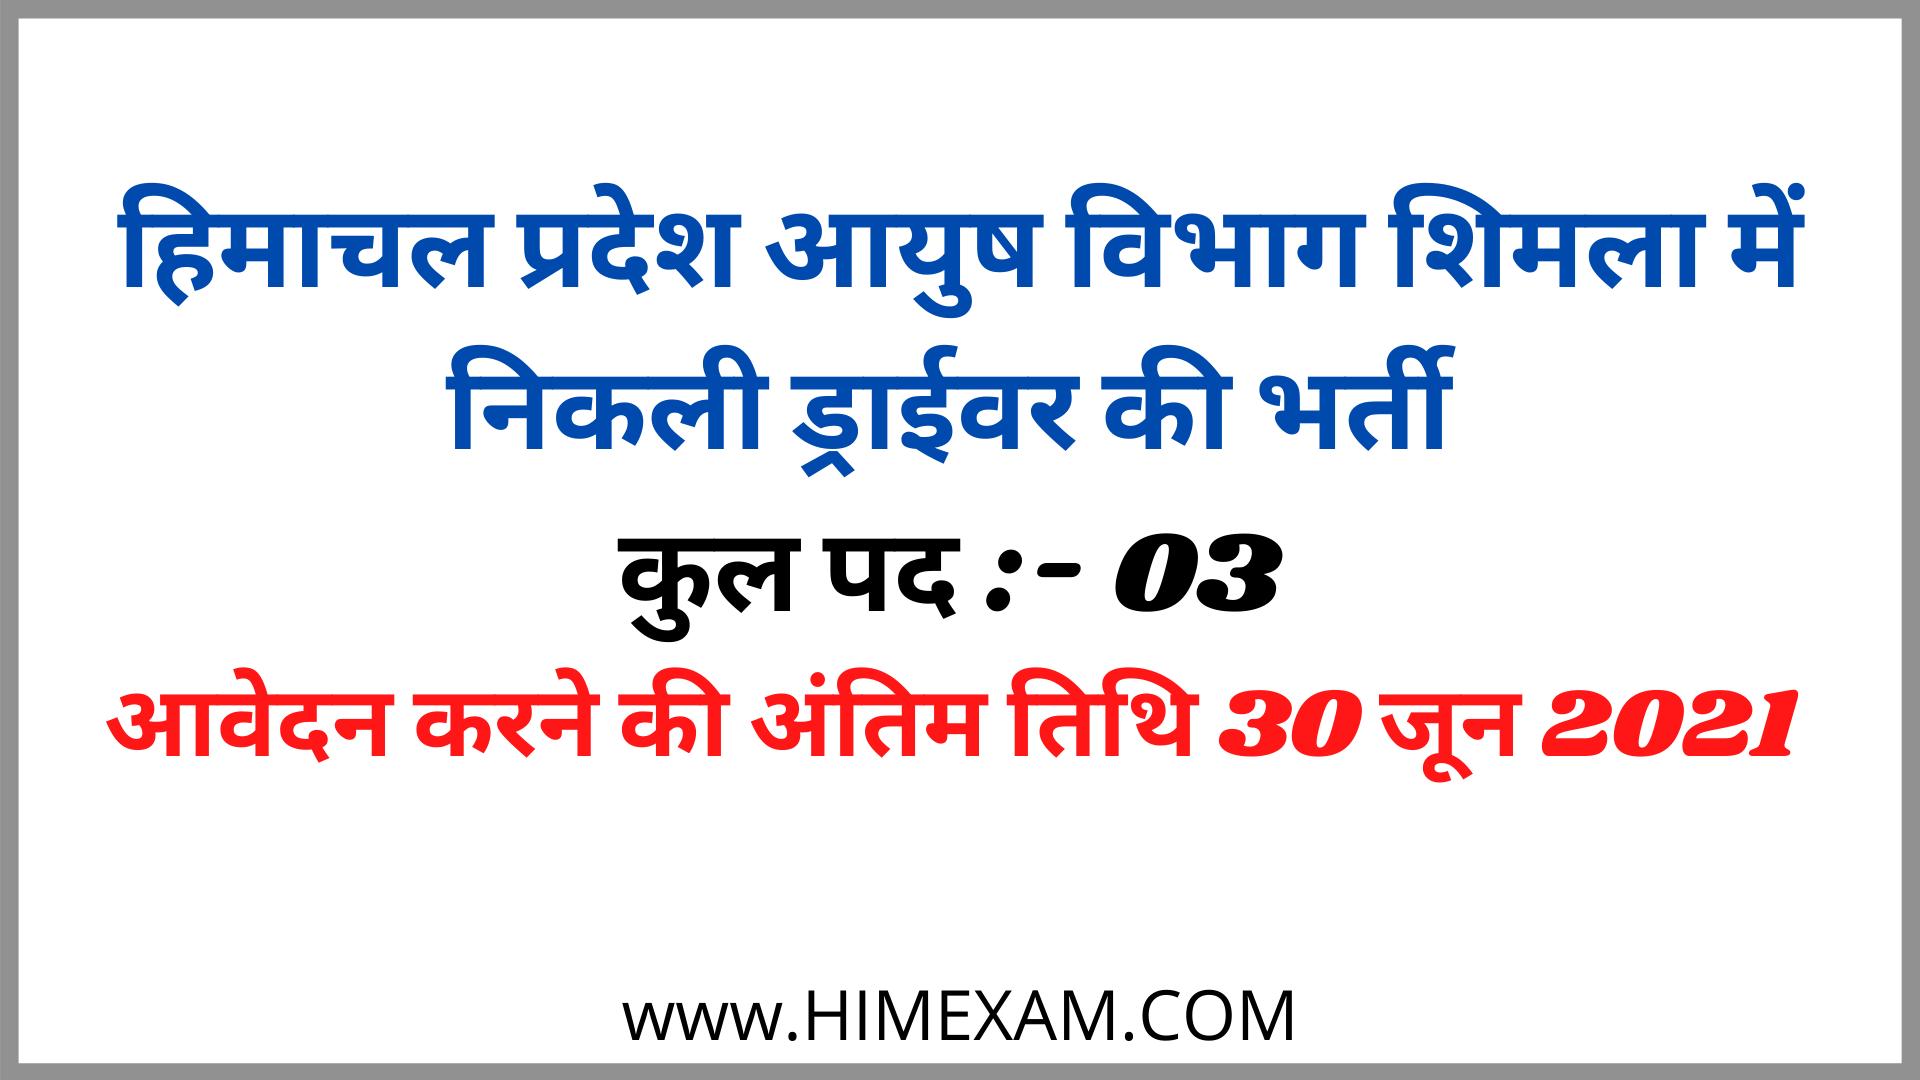 HP Ayush Vibhag Shimla Recruitment 2021-03 Driver Posts